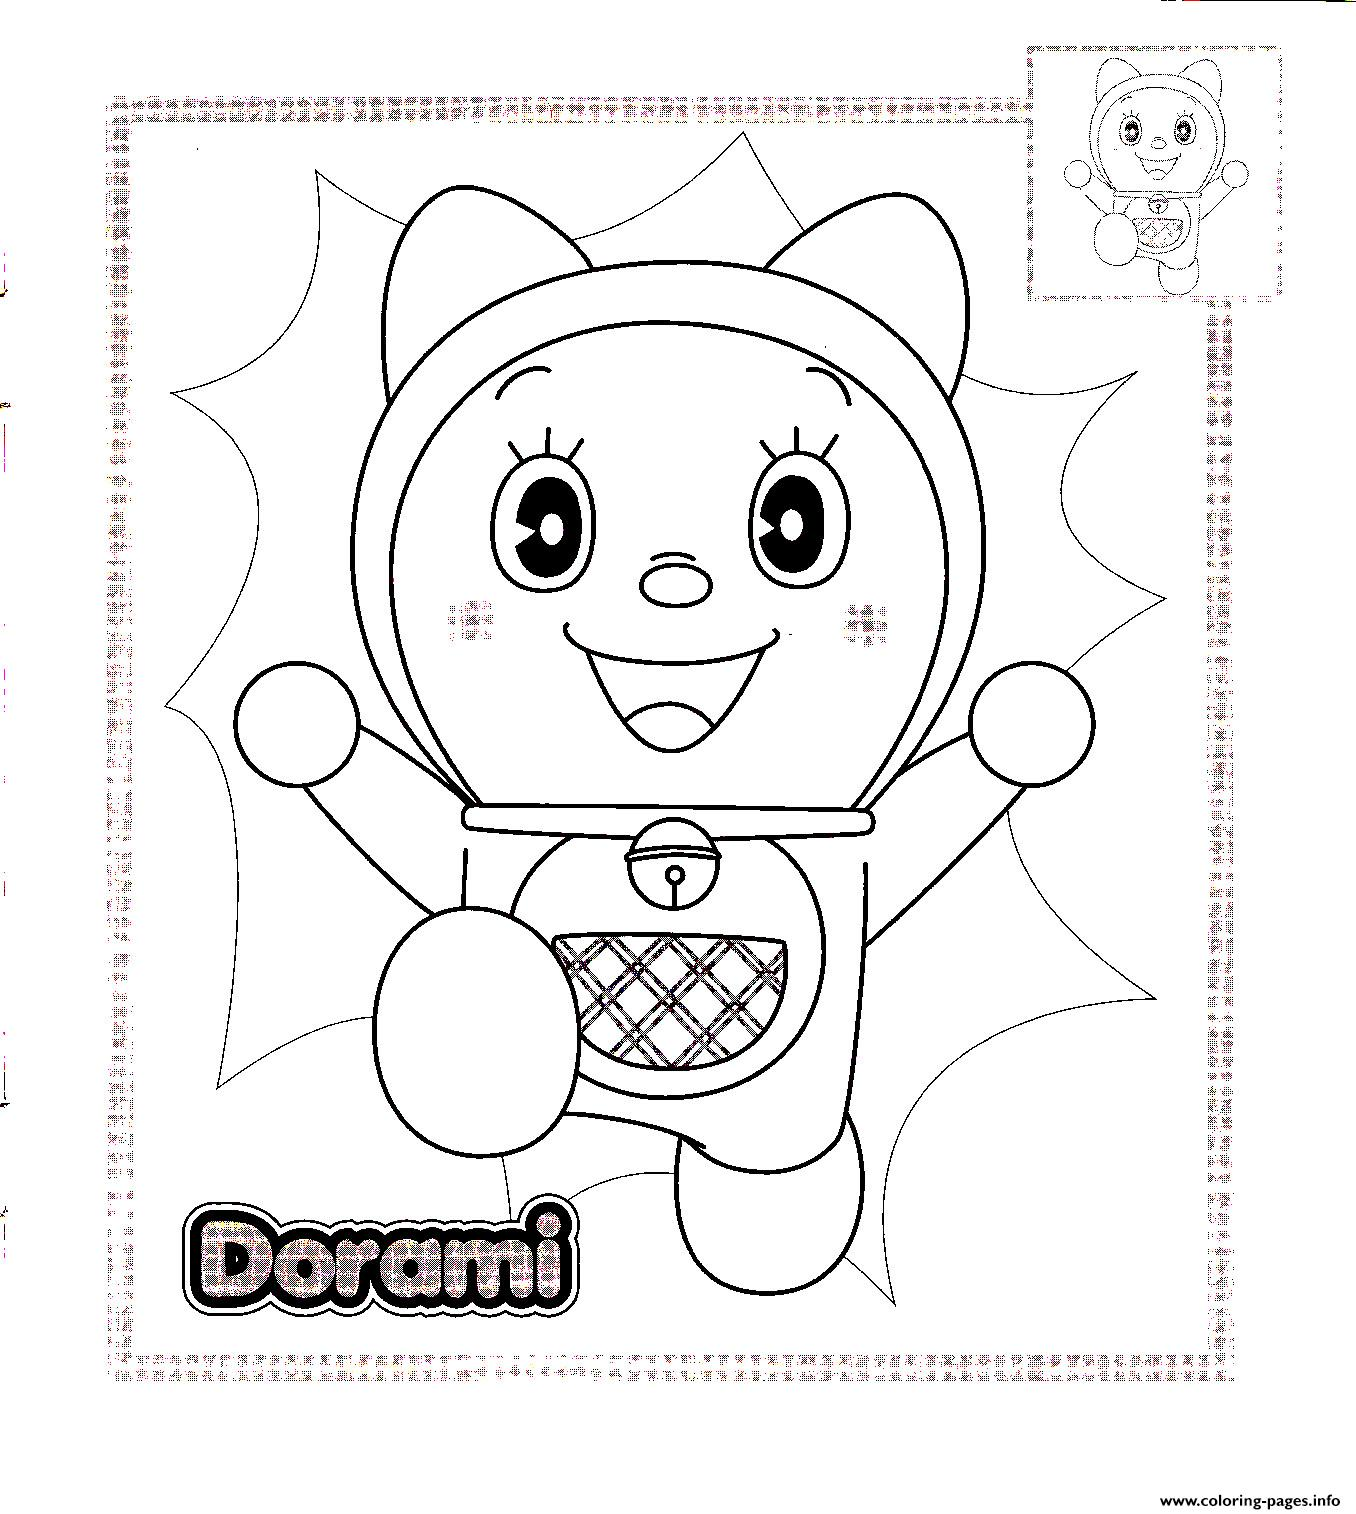 Dorami doraemon sb0b4 coloring pages printable Coloring book info